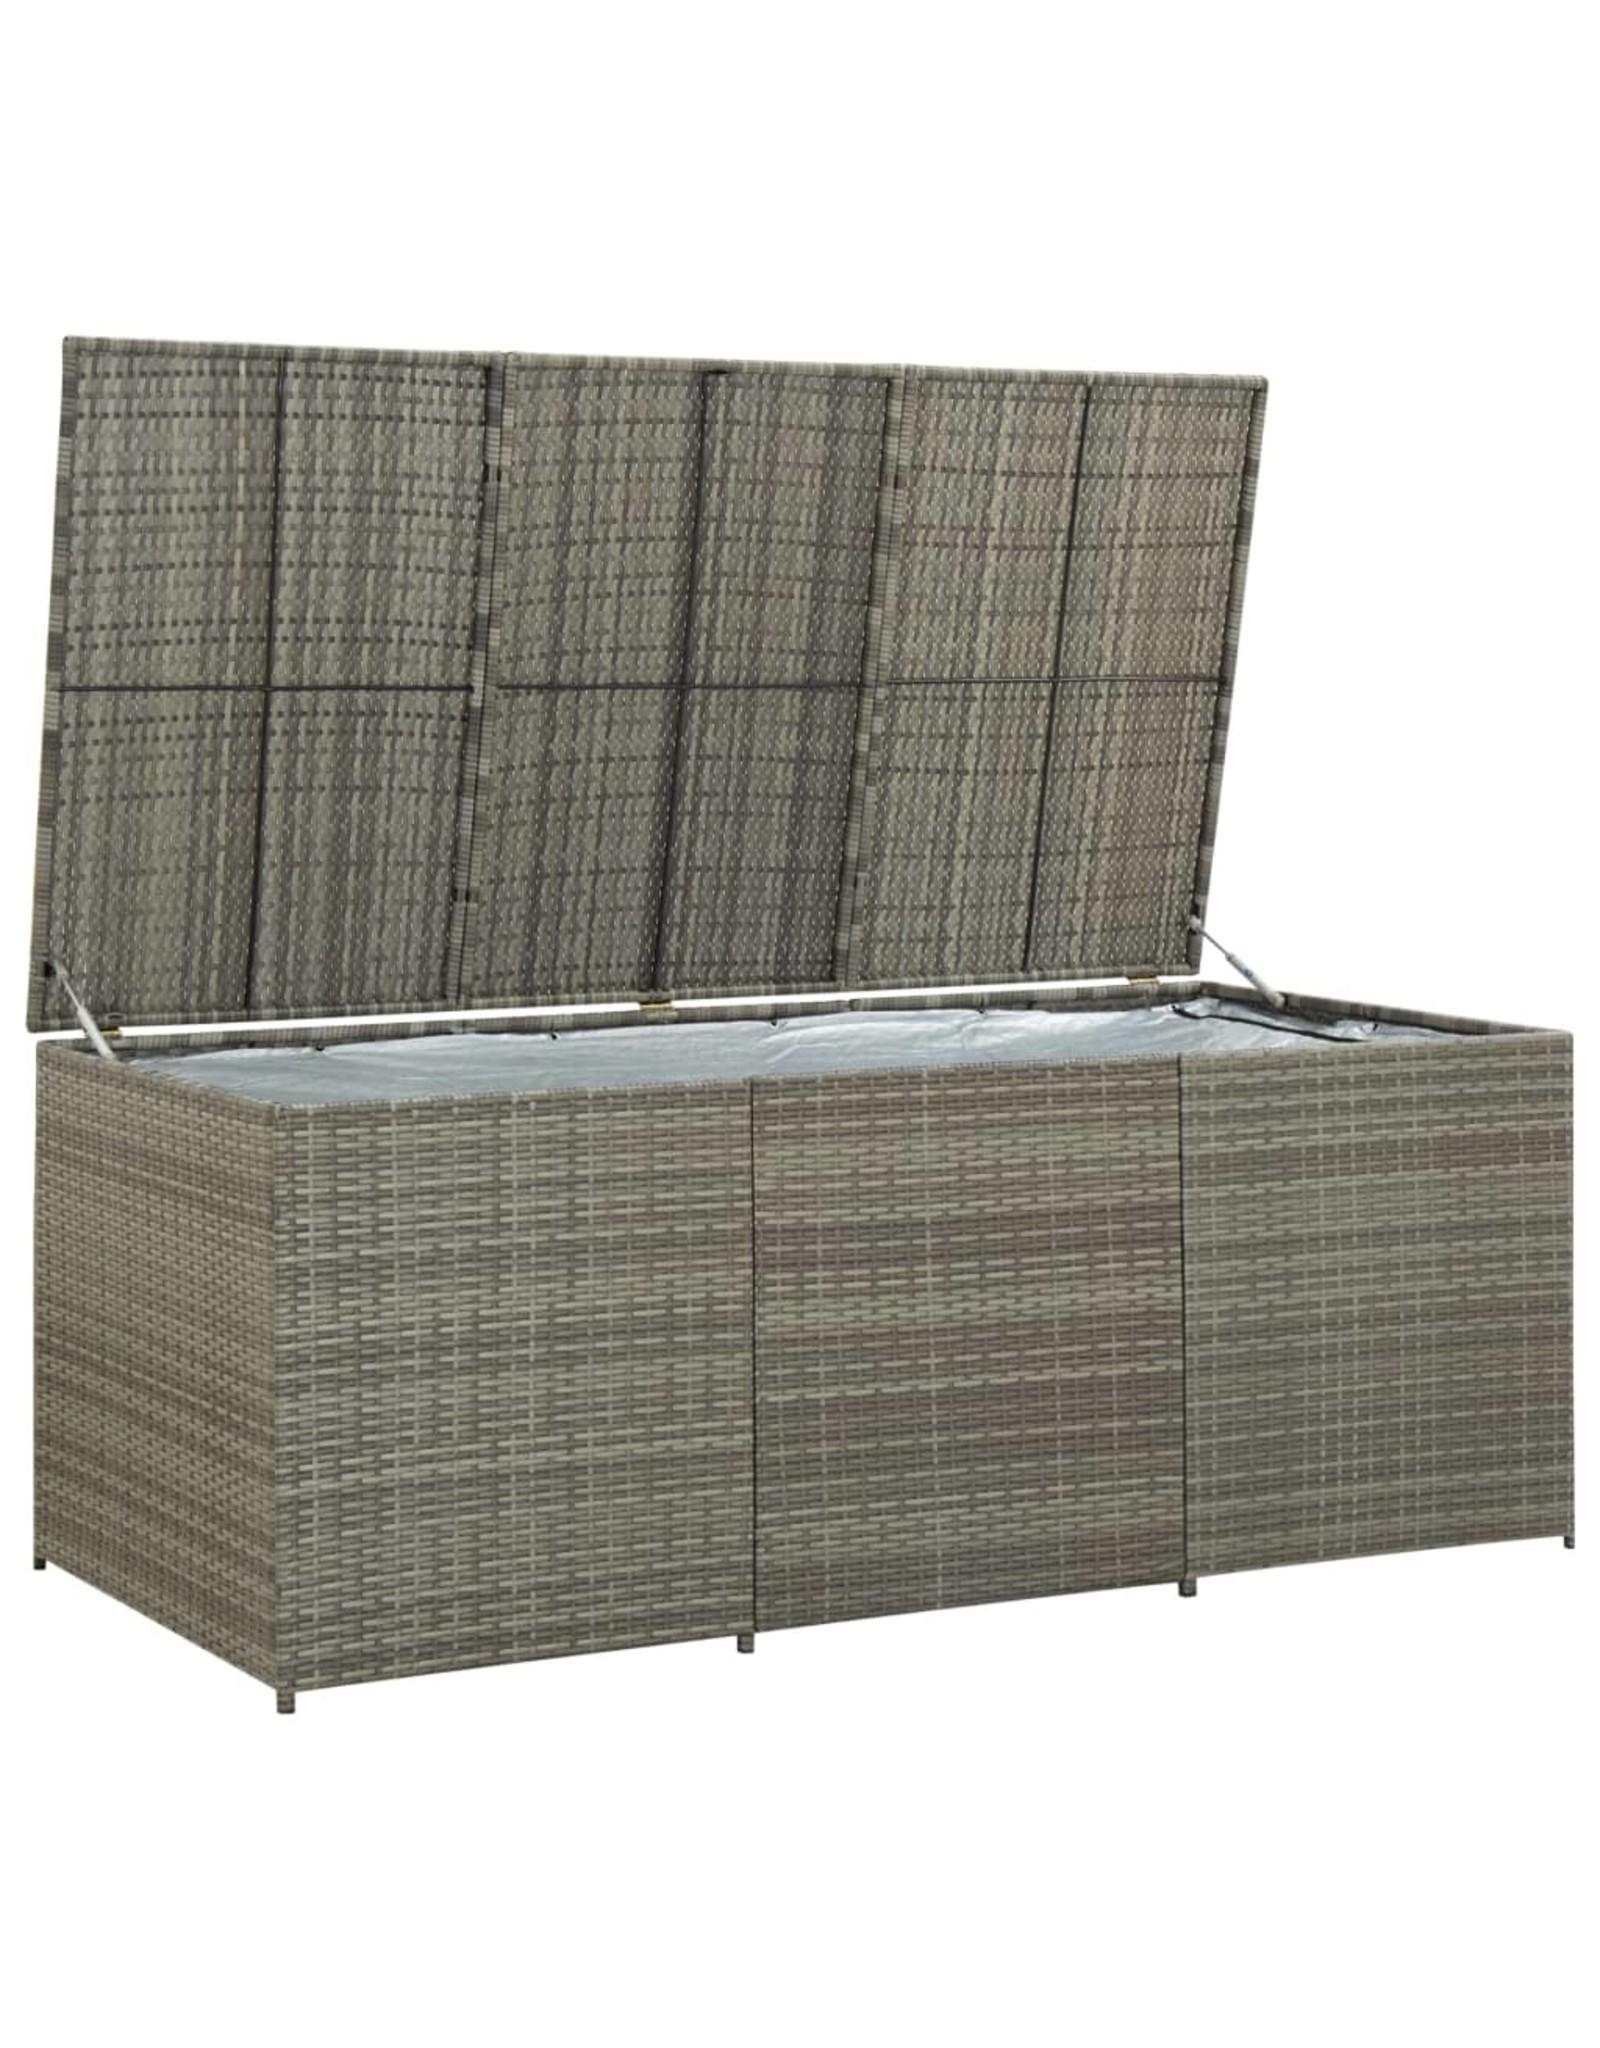 Tuinbox 180x90x75 cm poly rattan grijs